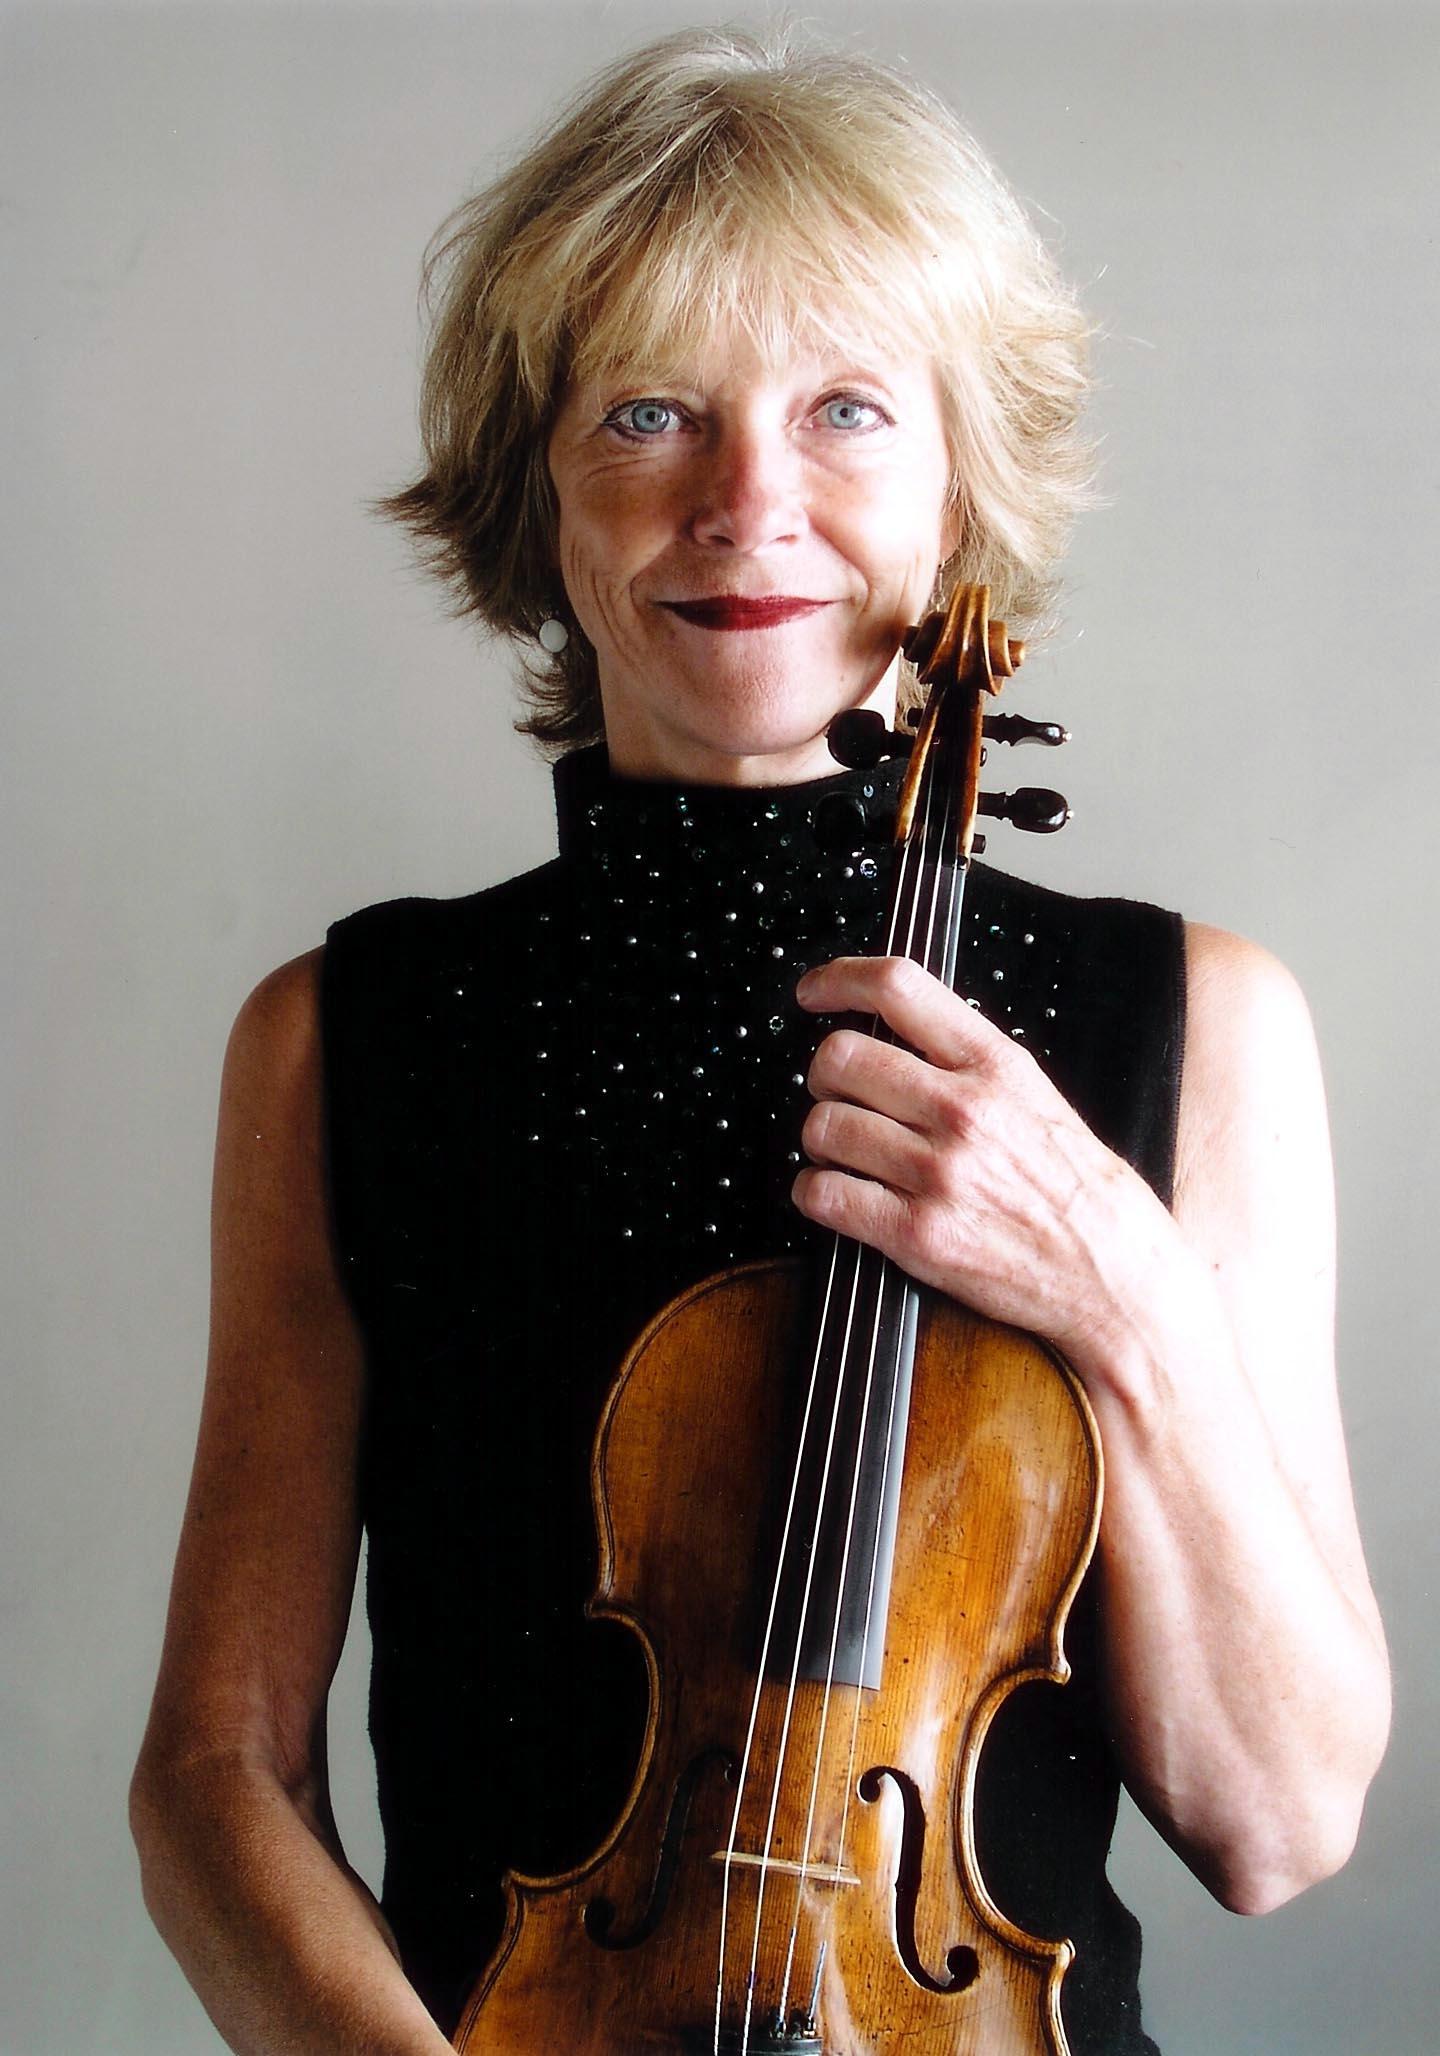 Emmy Verhey